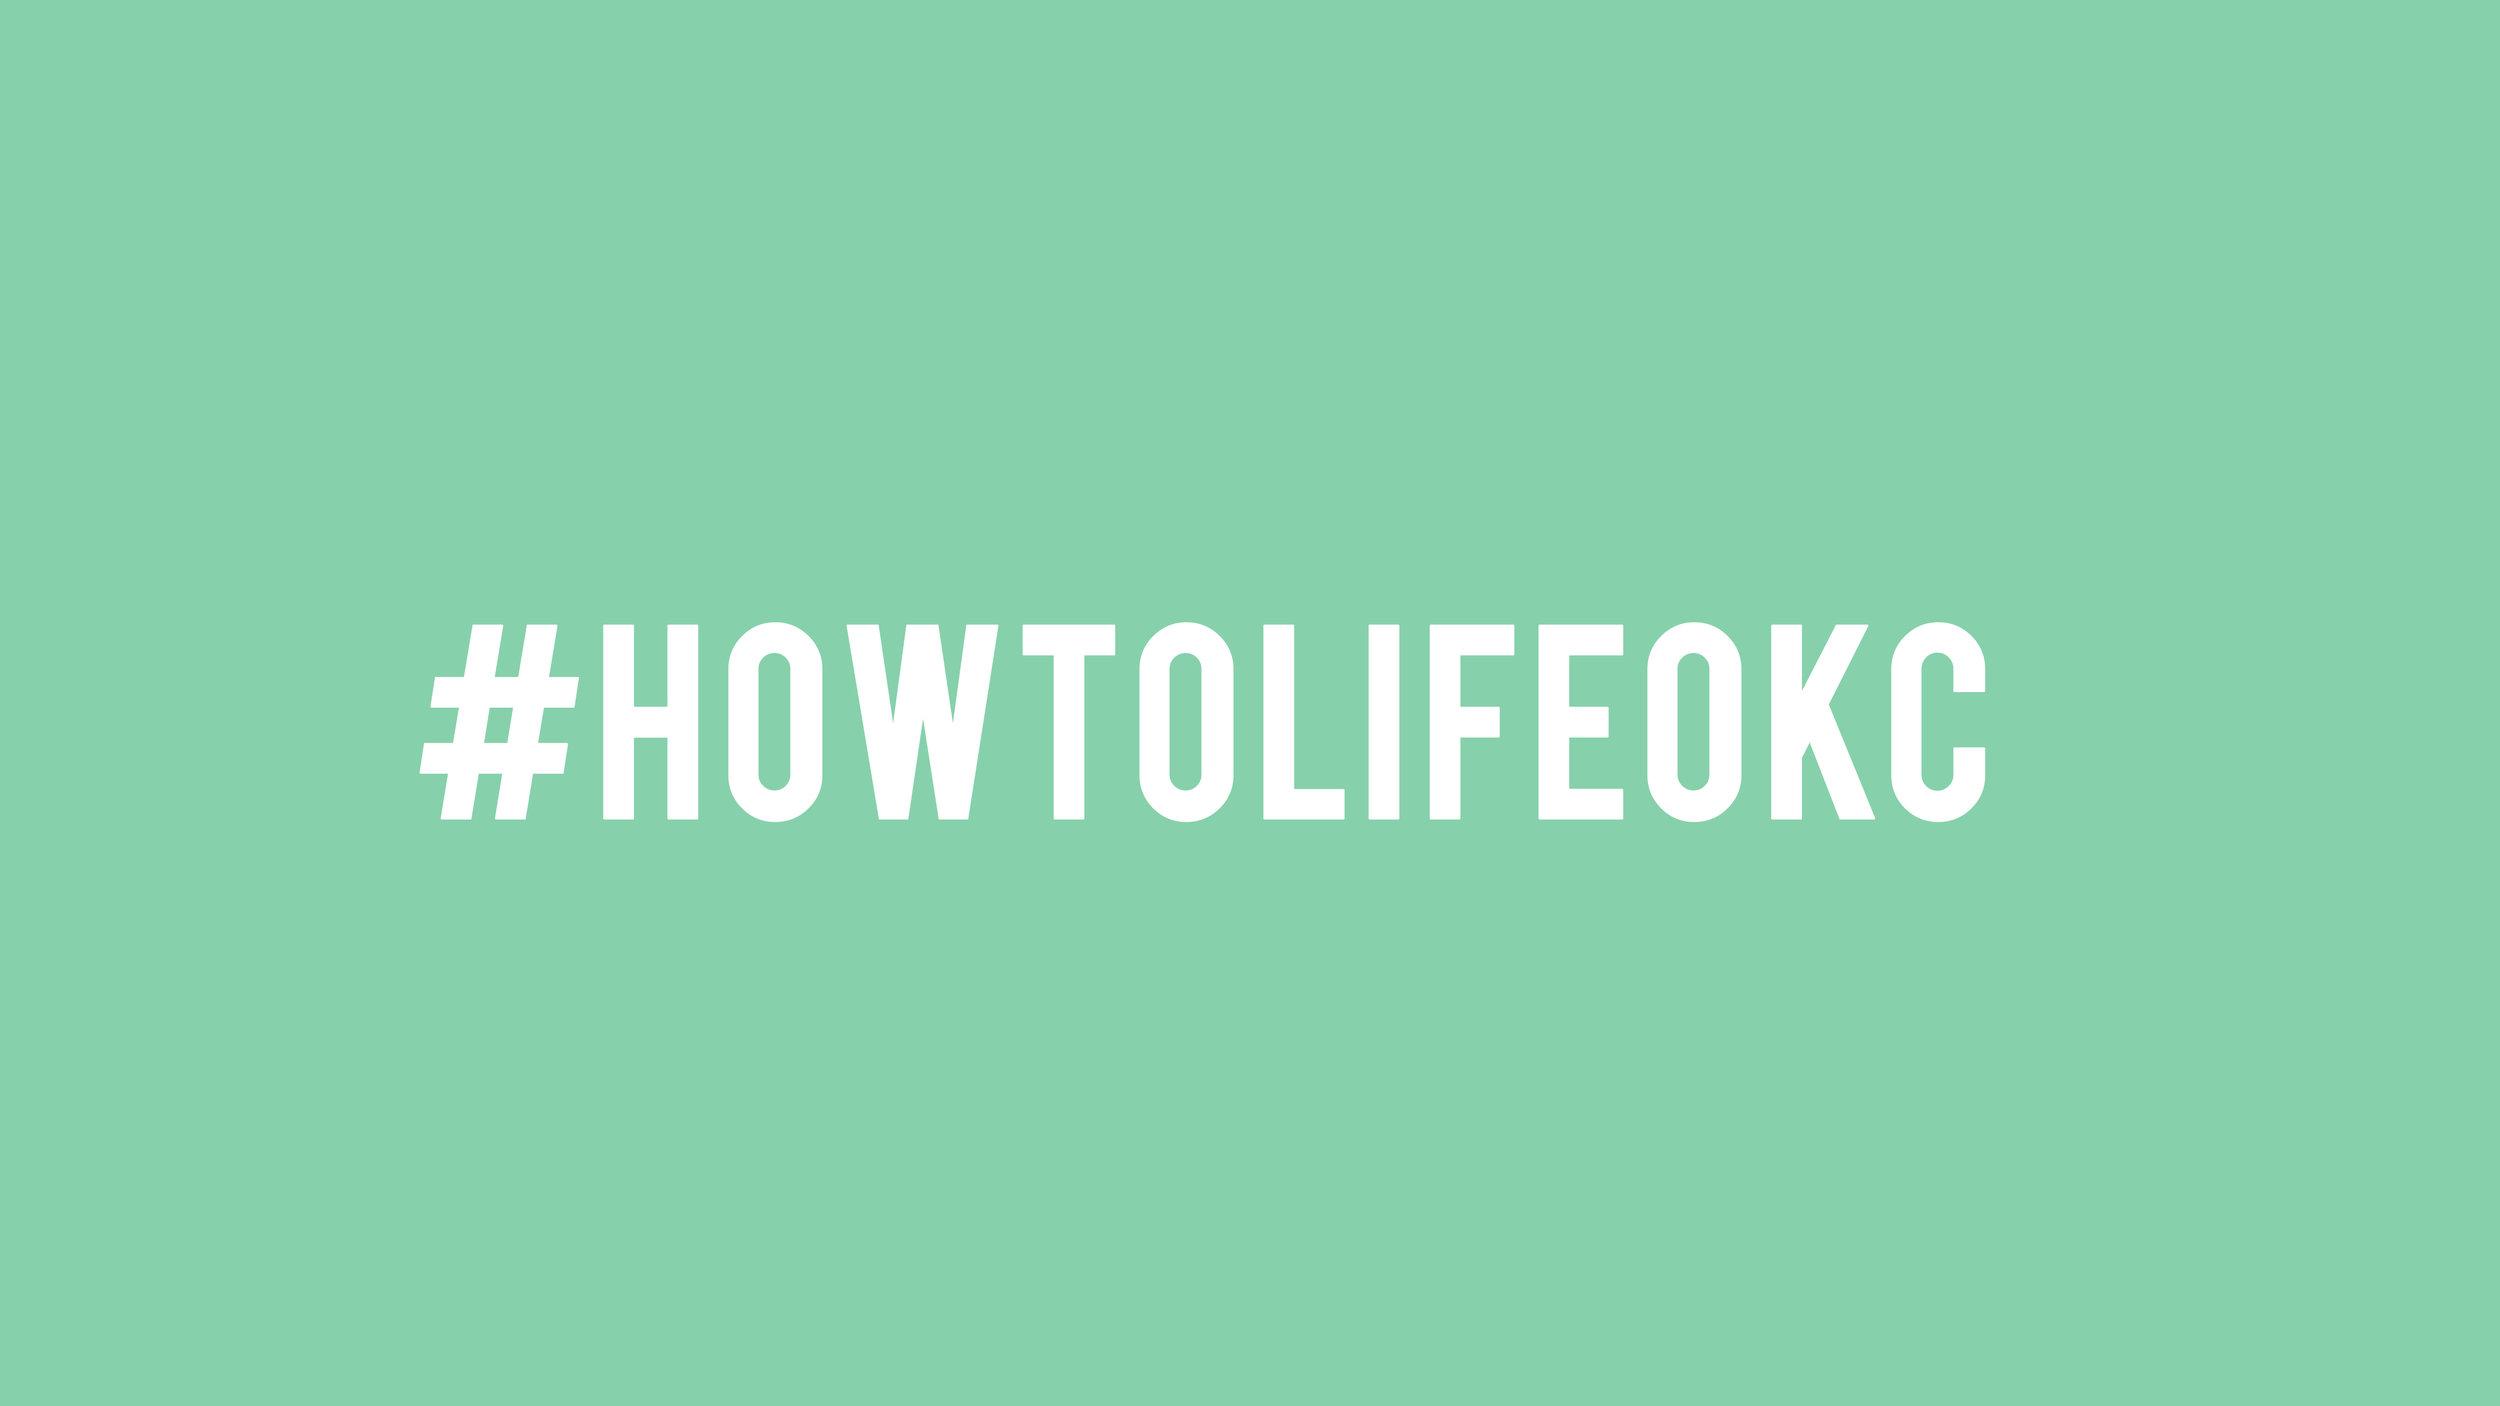 howtolifeOKC1.jpg